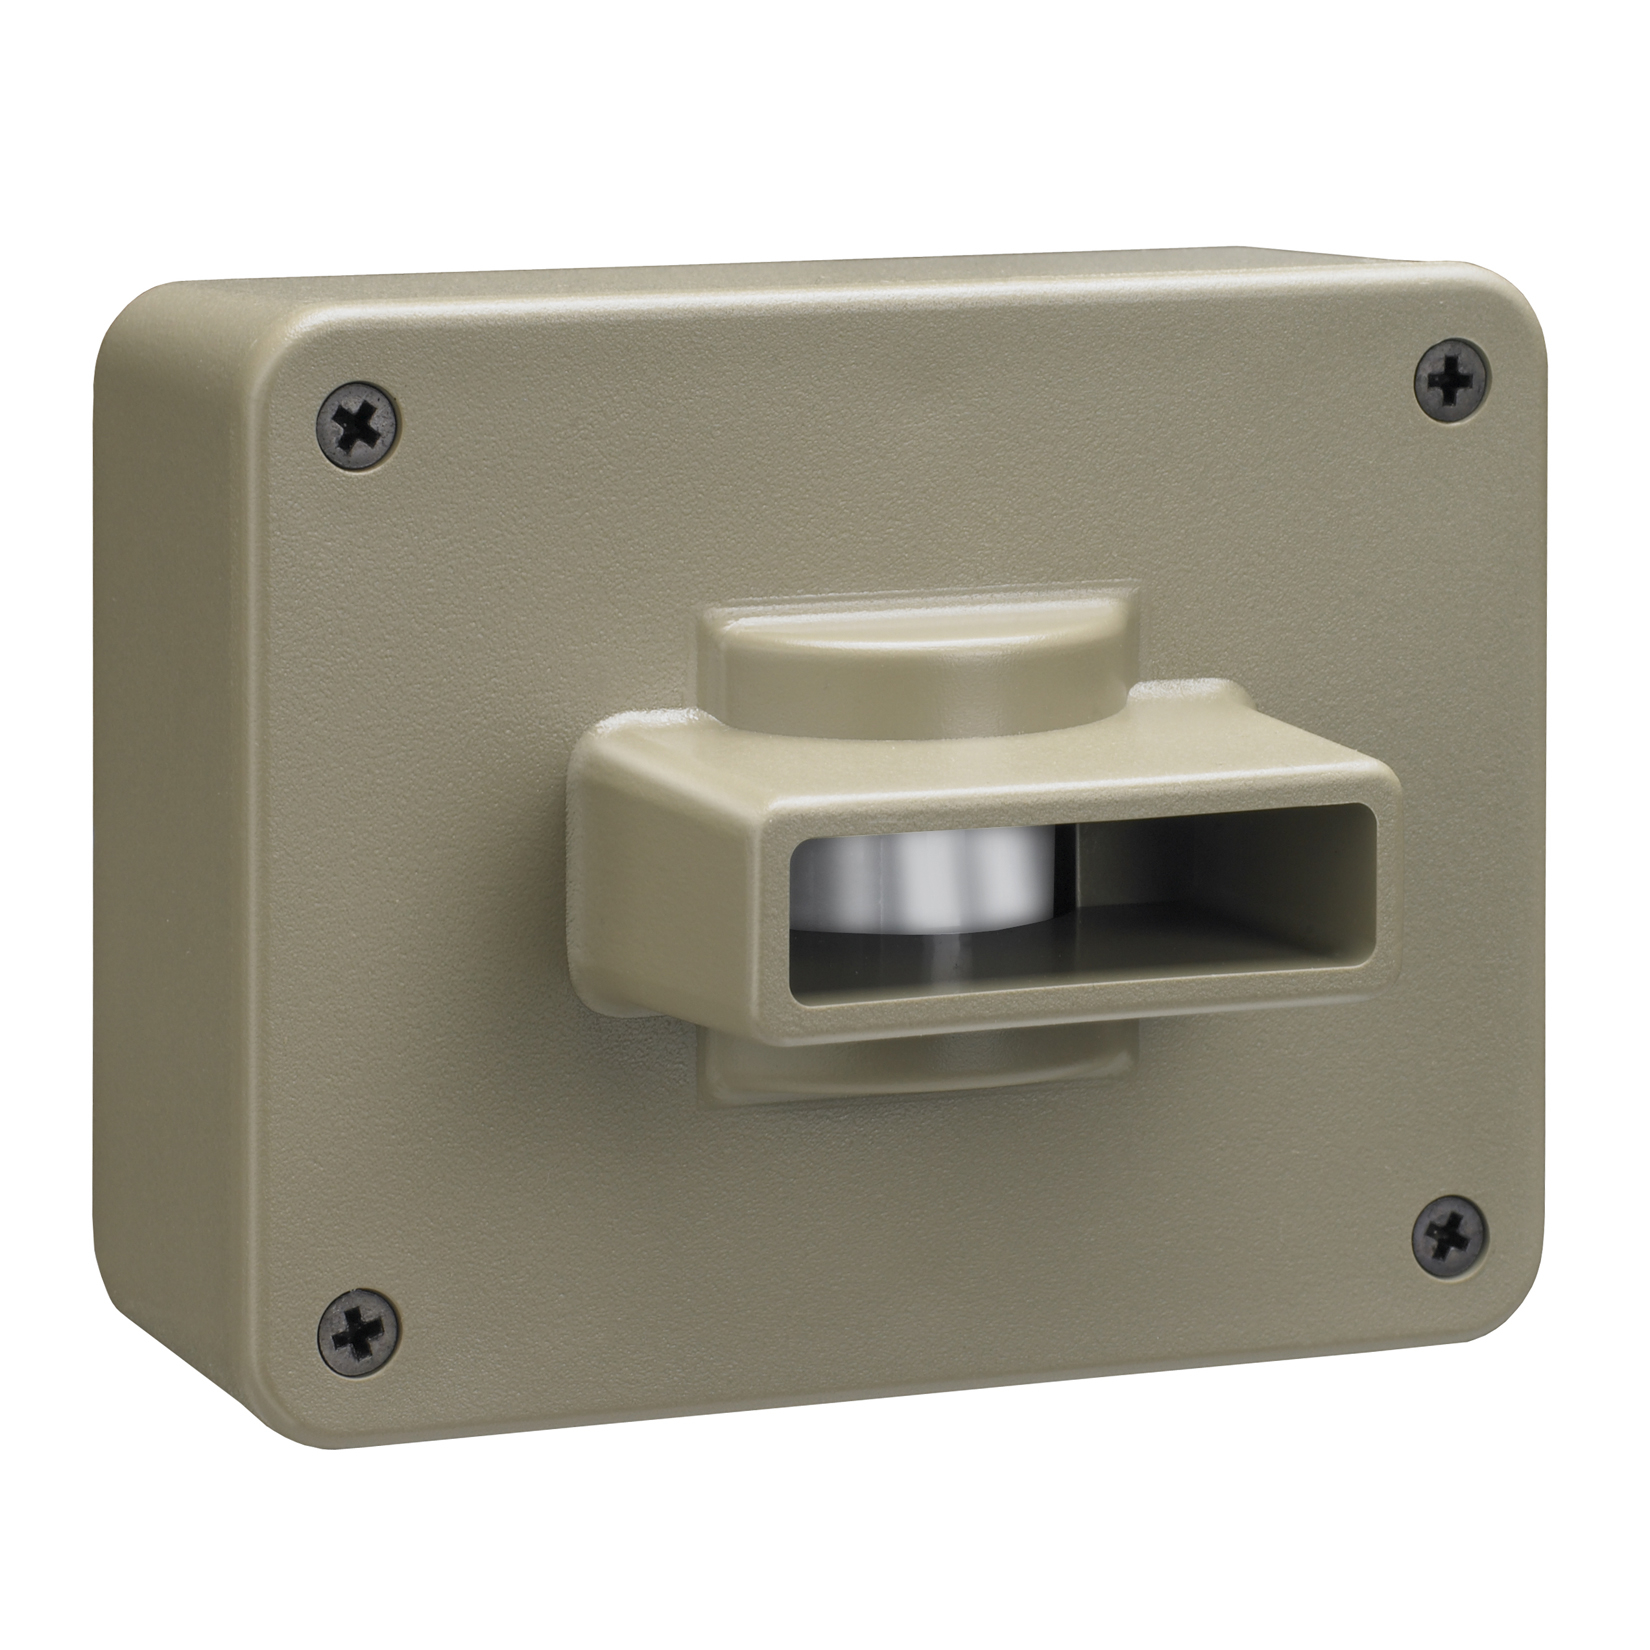 Chamberlain CWPIR Wireless Motion Alert Add On Sensor by Chamberlain